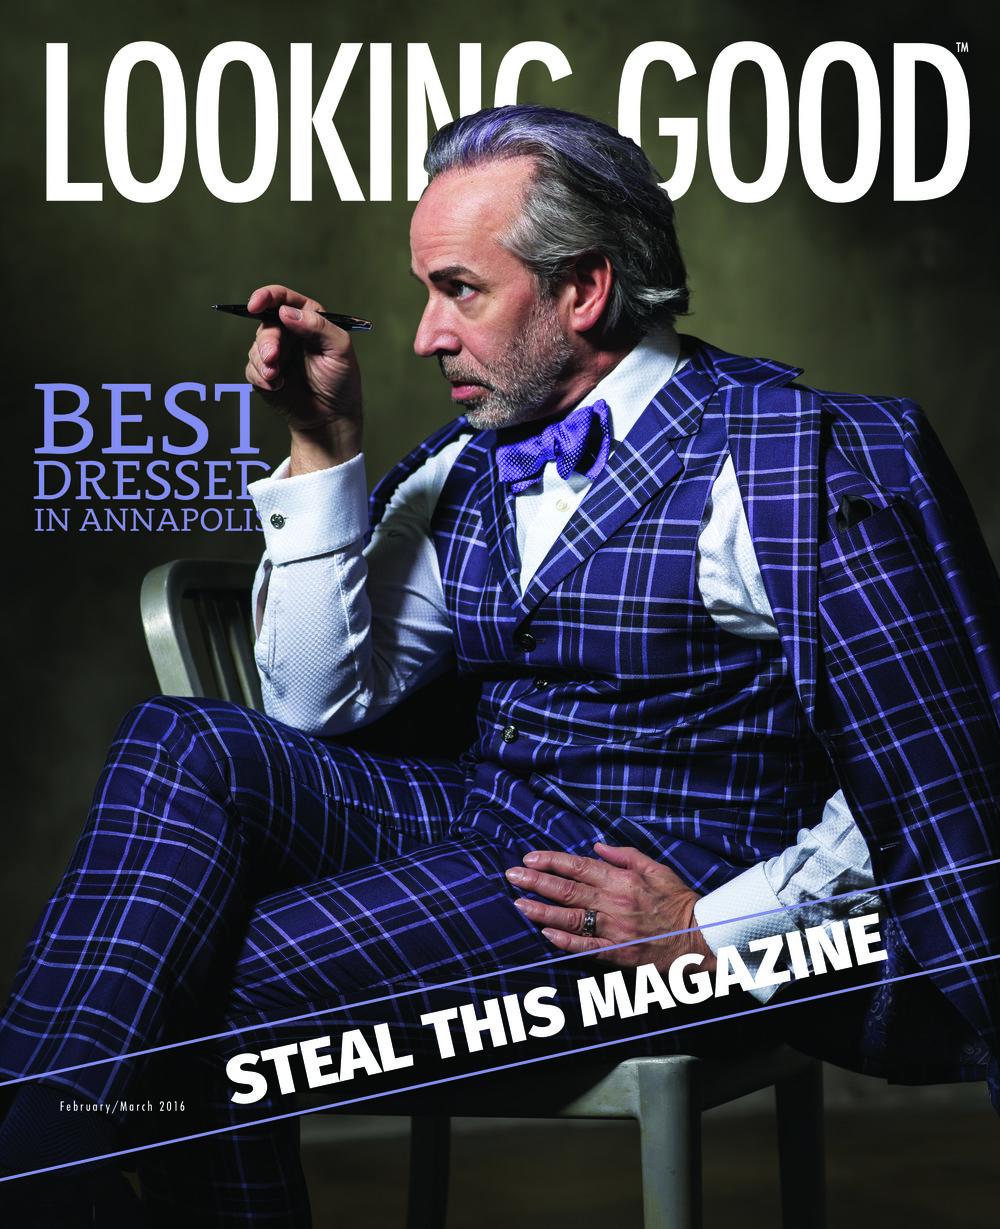 LookingGoodVol2No4_COVER2.jpg